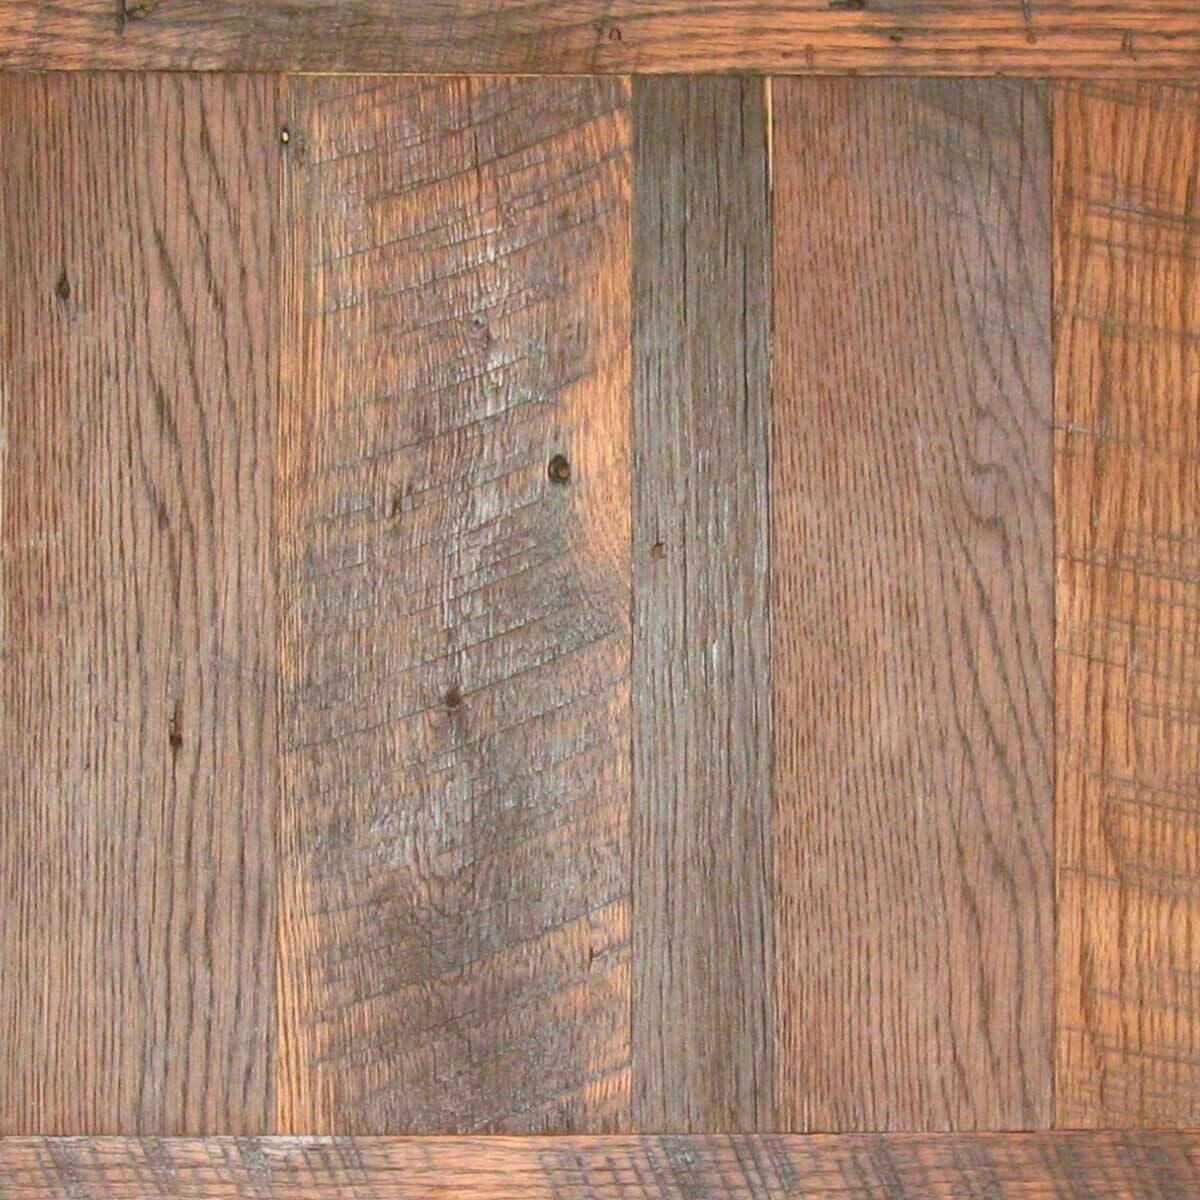 Natural oiled Carolina Character Oak wood finish by whole log lumber